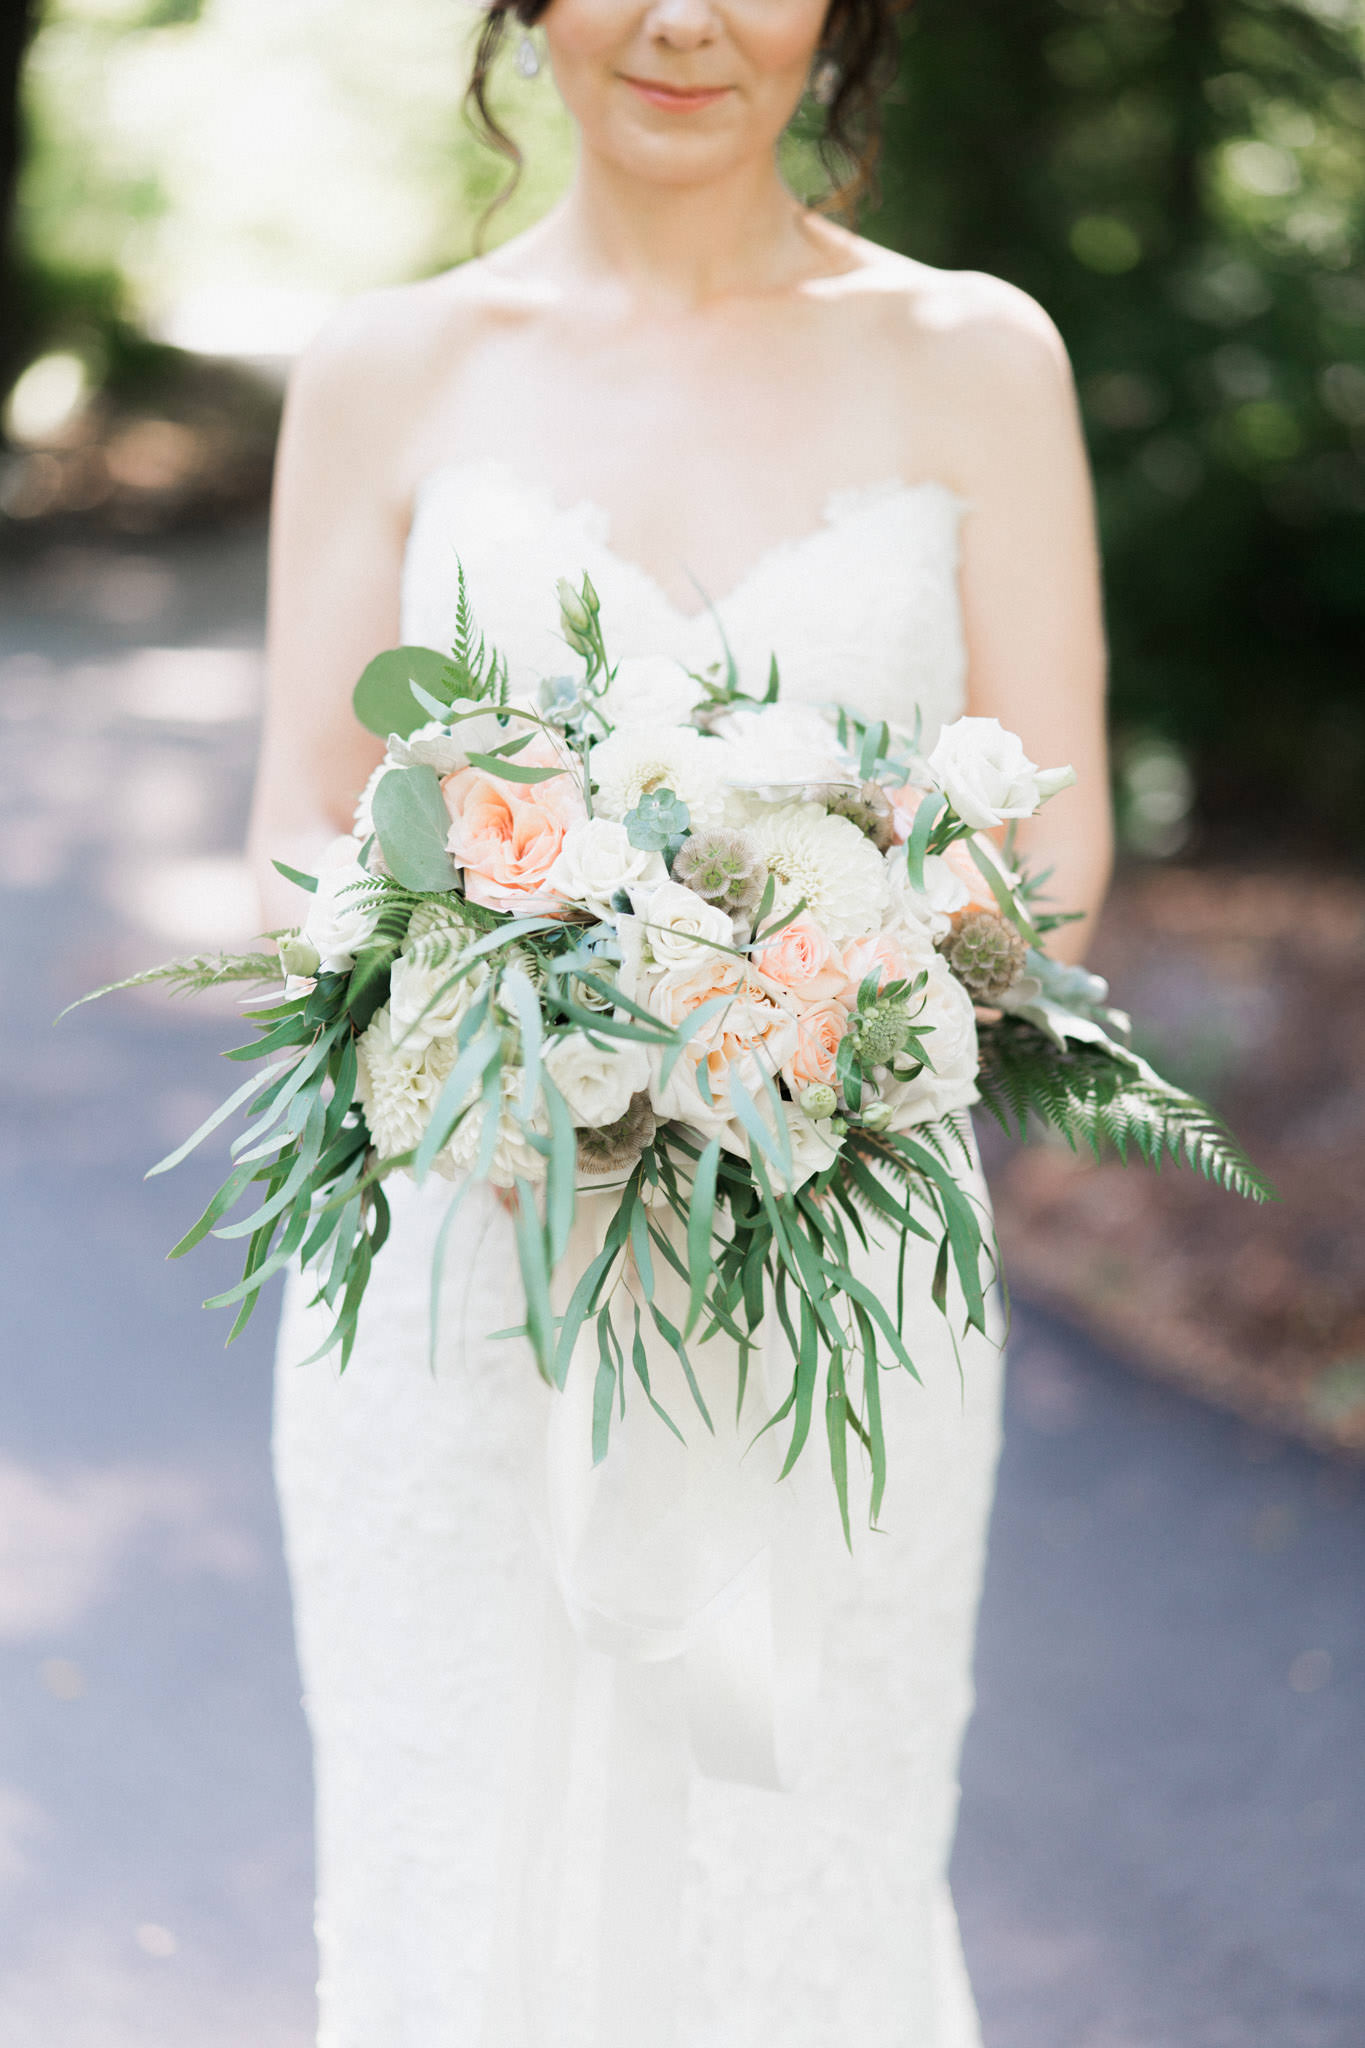 Thomas Hobbs wedding bouquet